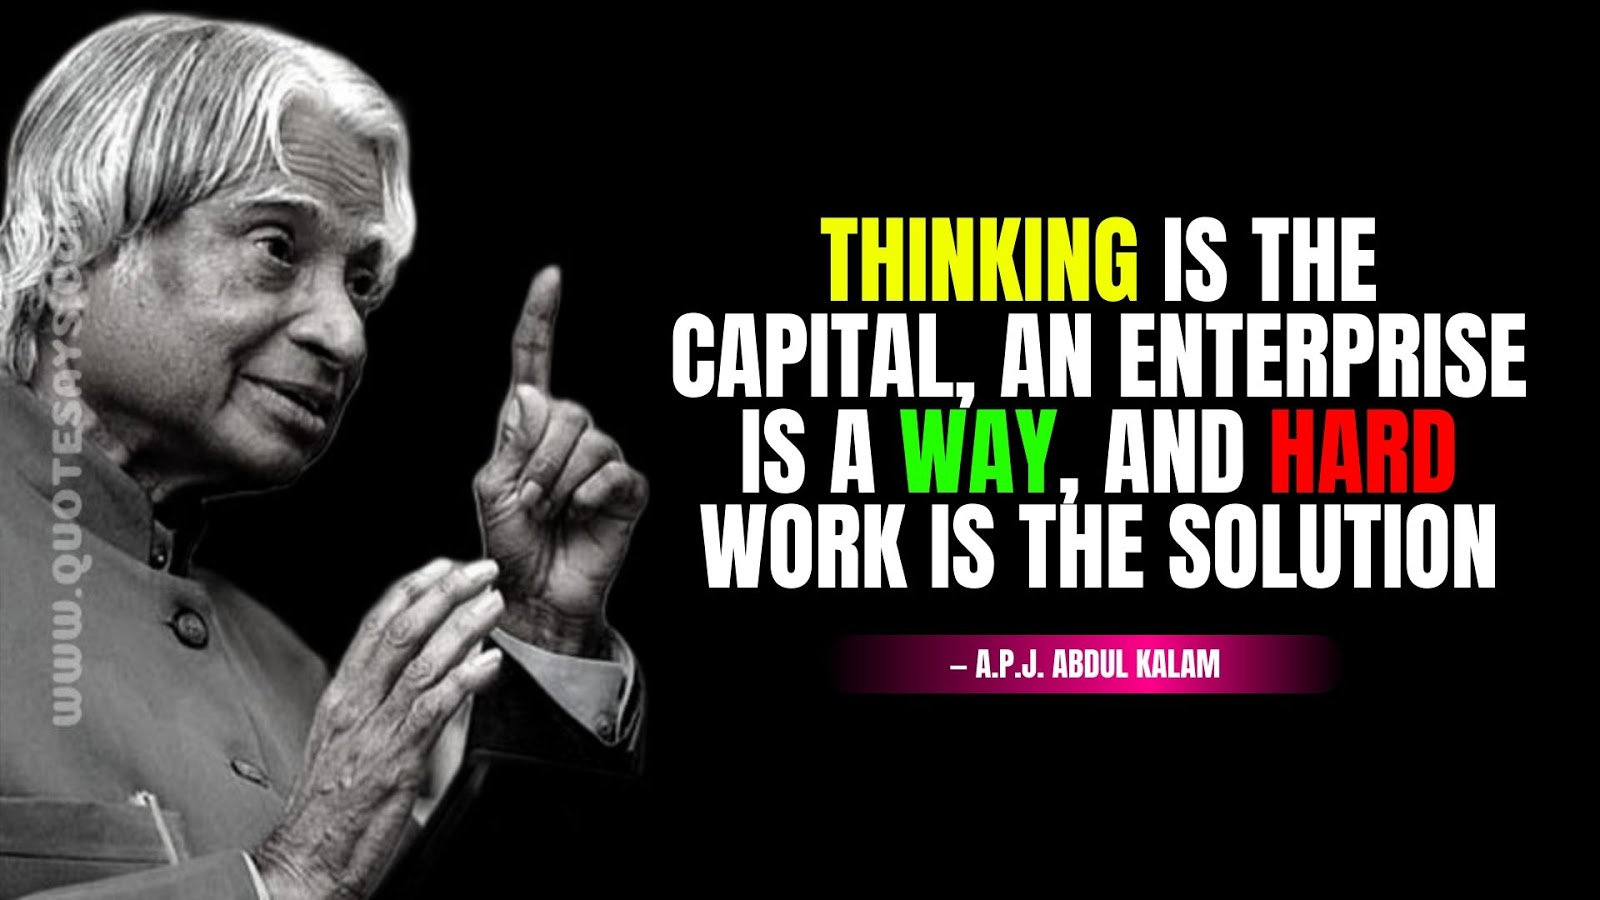 Apj Abdul Kalam Quotes About Hadwork